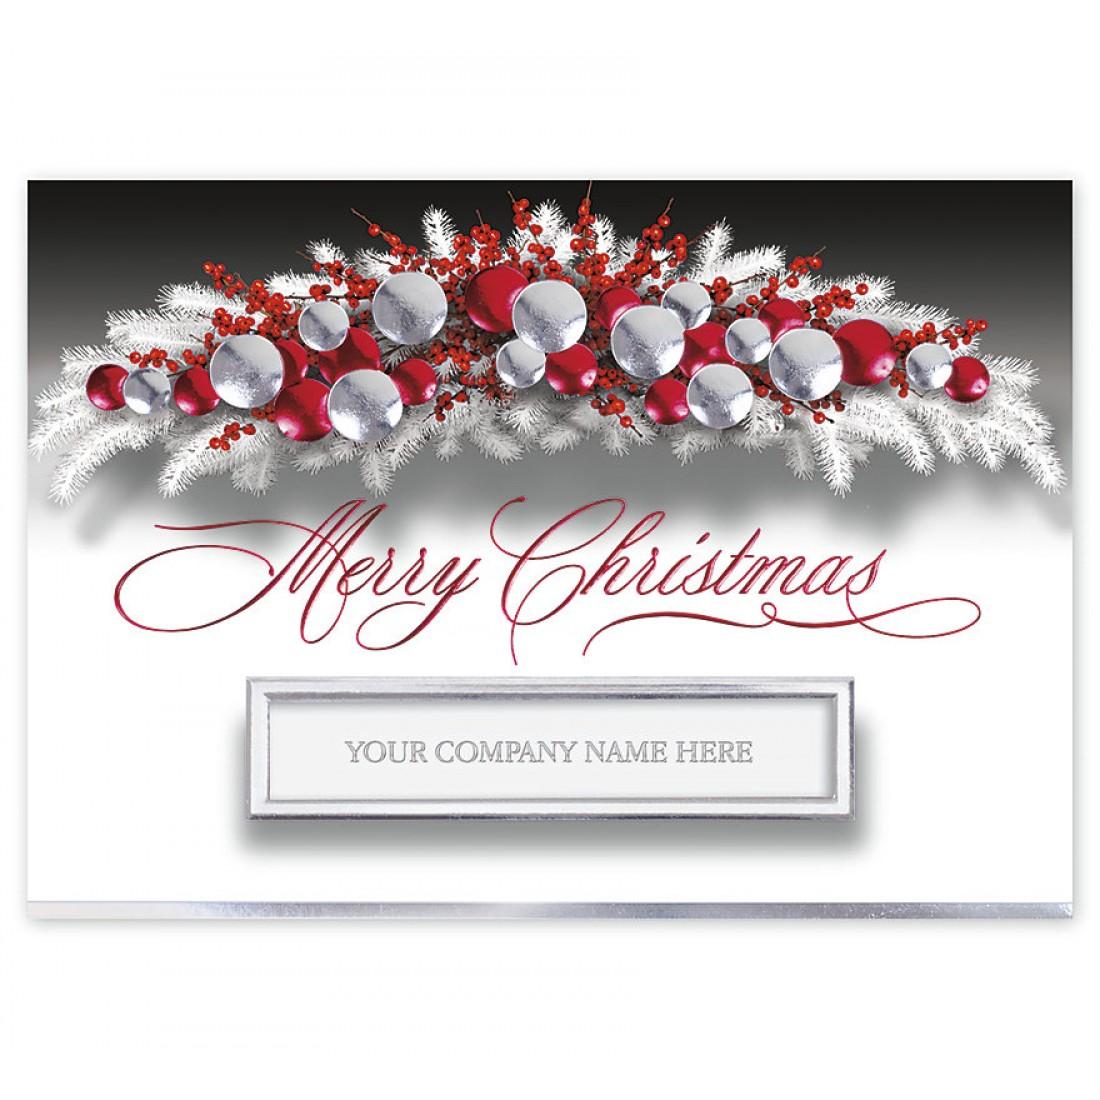 Merry Magic Christmas Cards H17680 At Print EZ.